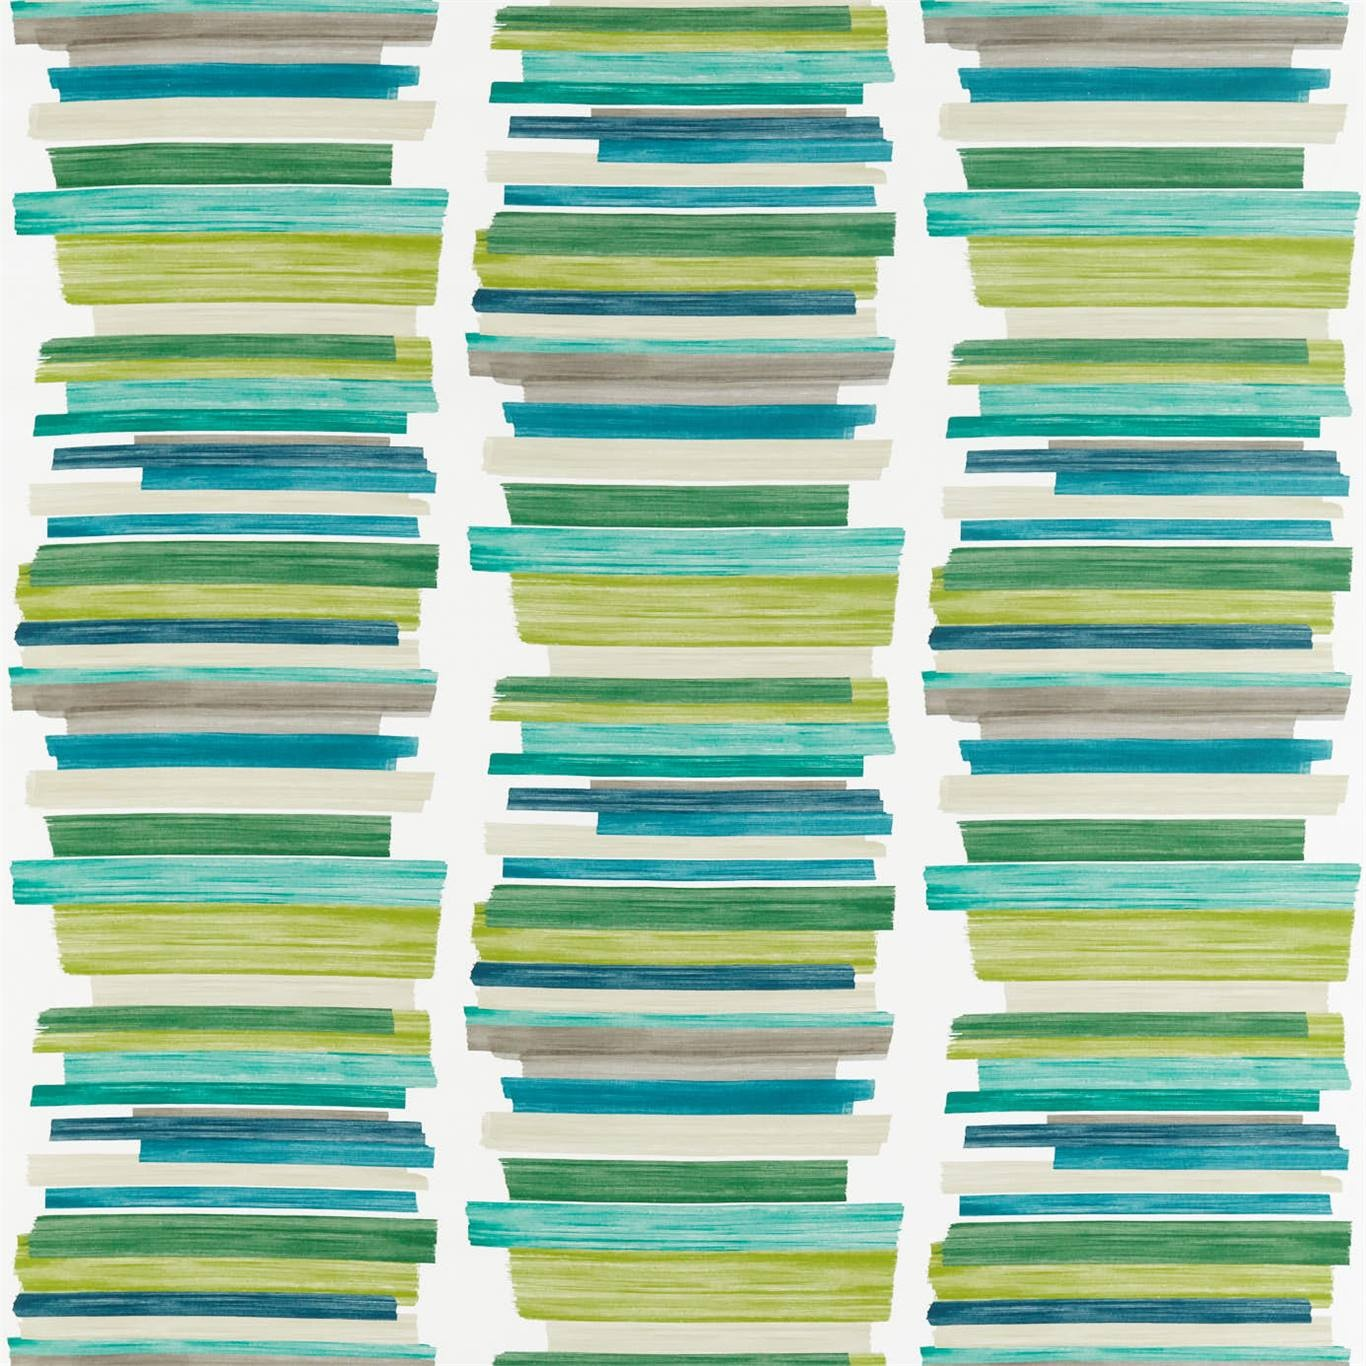 Image of Harlequin Calcine Emerald / Zest / Marine Curtain Fabric 120805